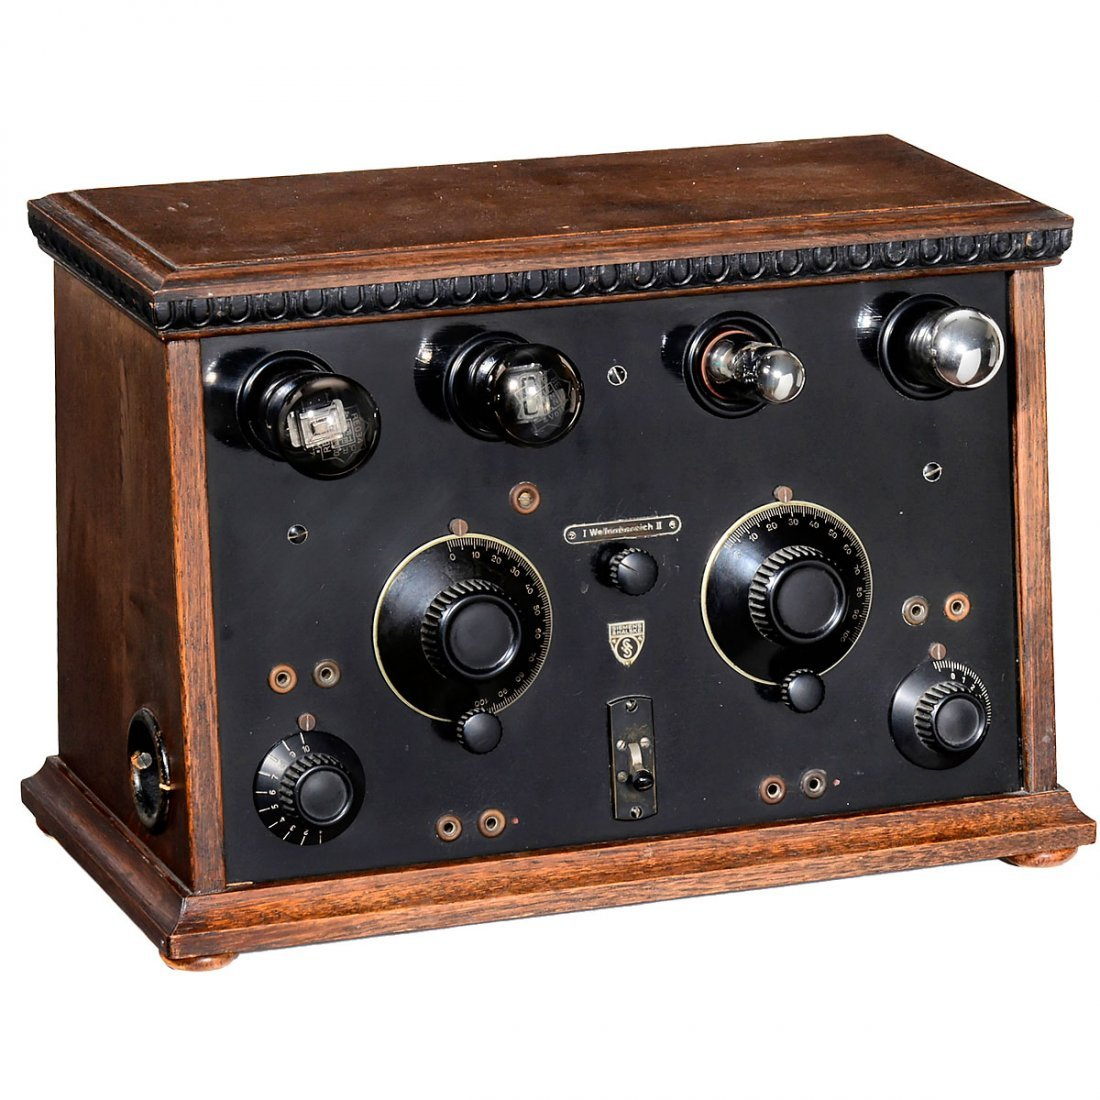 Siemens & Halske Type RFE 22 Radio, 1927